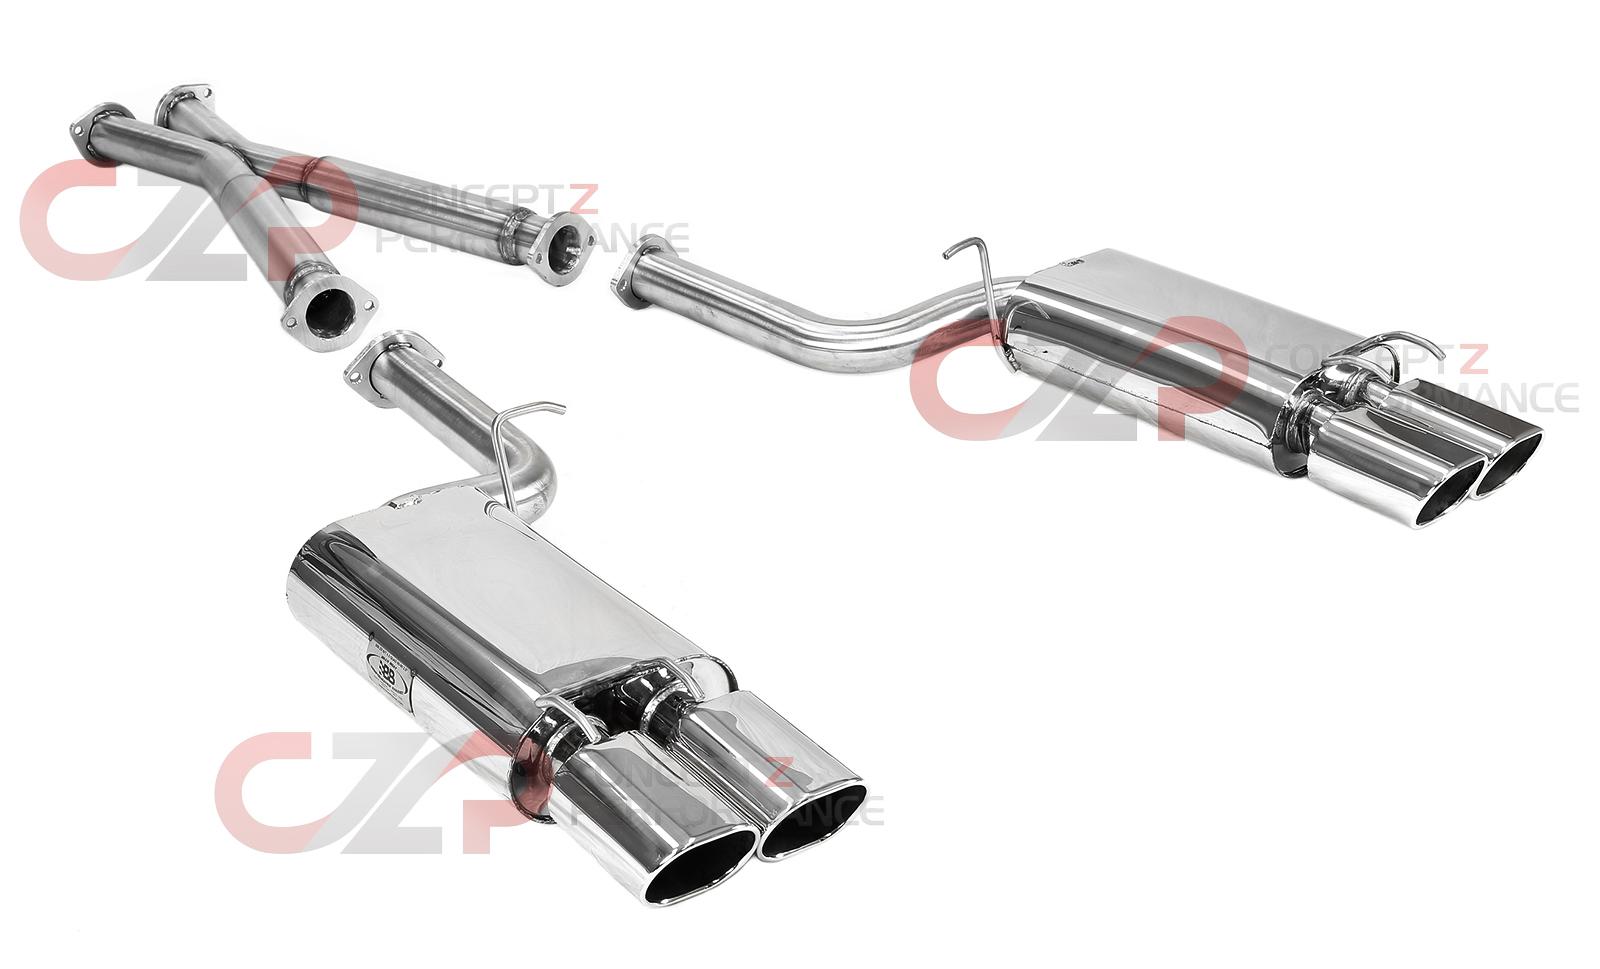 Nissan 240sx Oem Parts ... Nissan 300ZX 90-96 Z32 FPIM-0035_0065_73 - Nissan performance parts